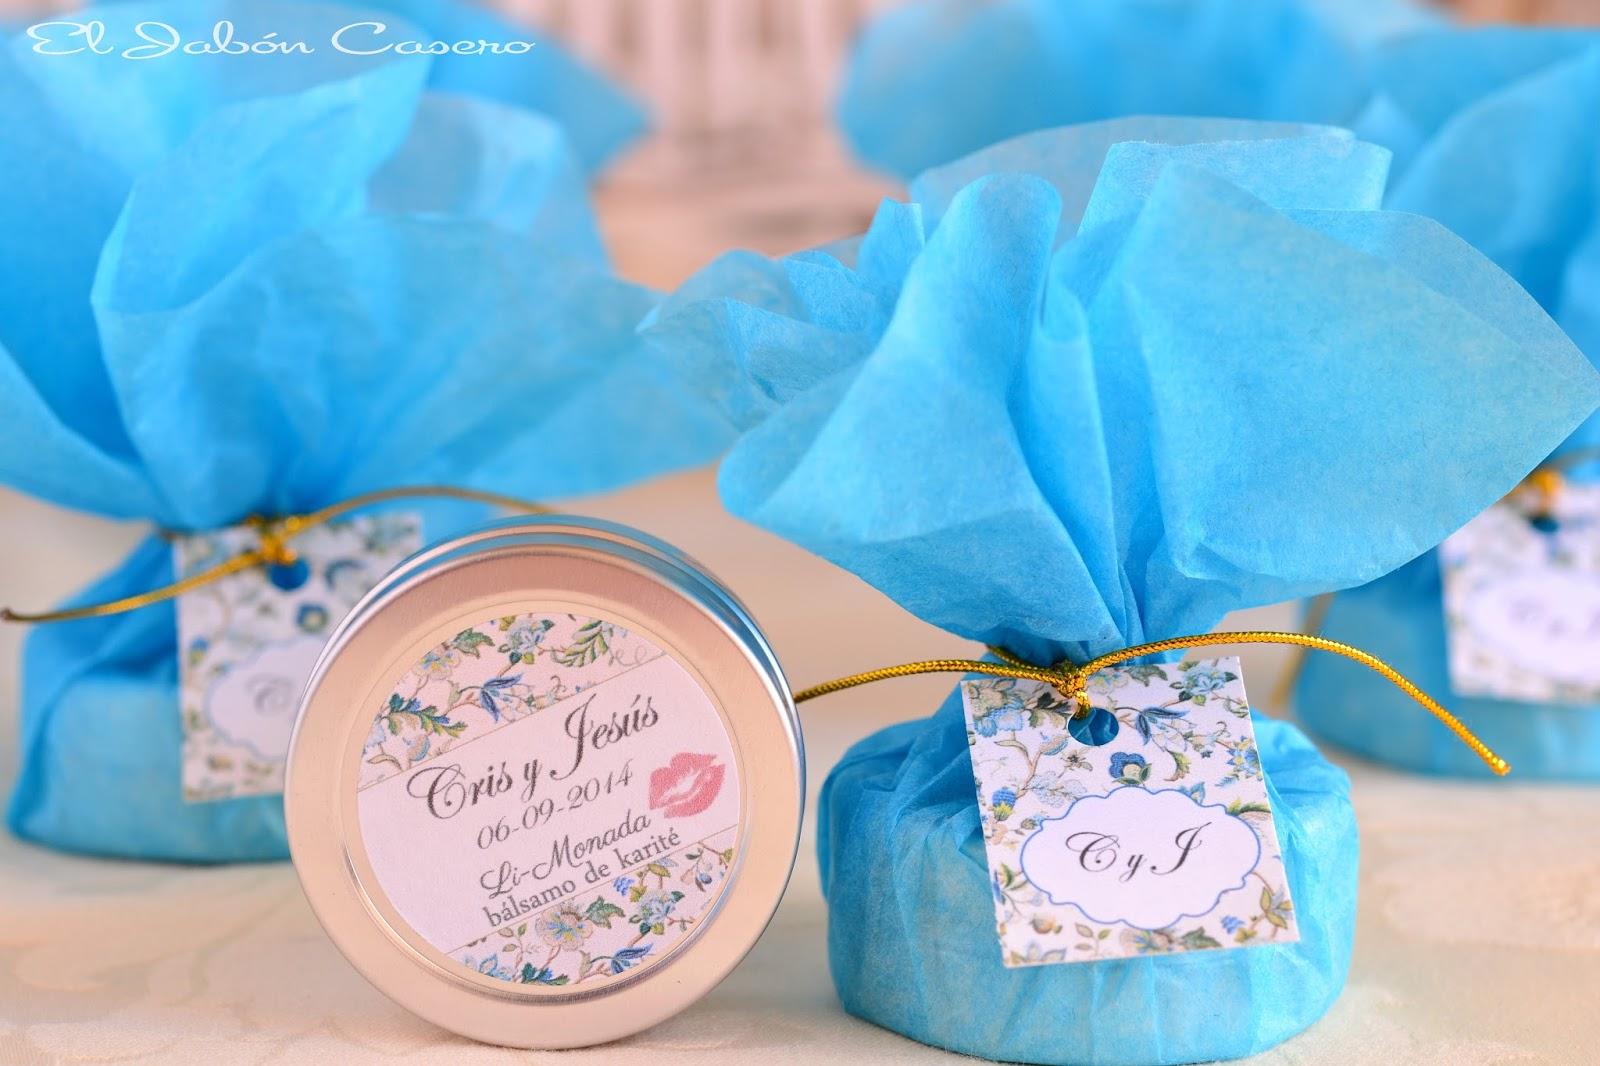 detalles de boda balsamos naturales personalizados